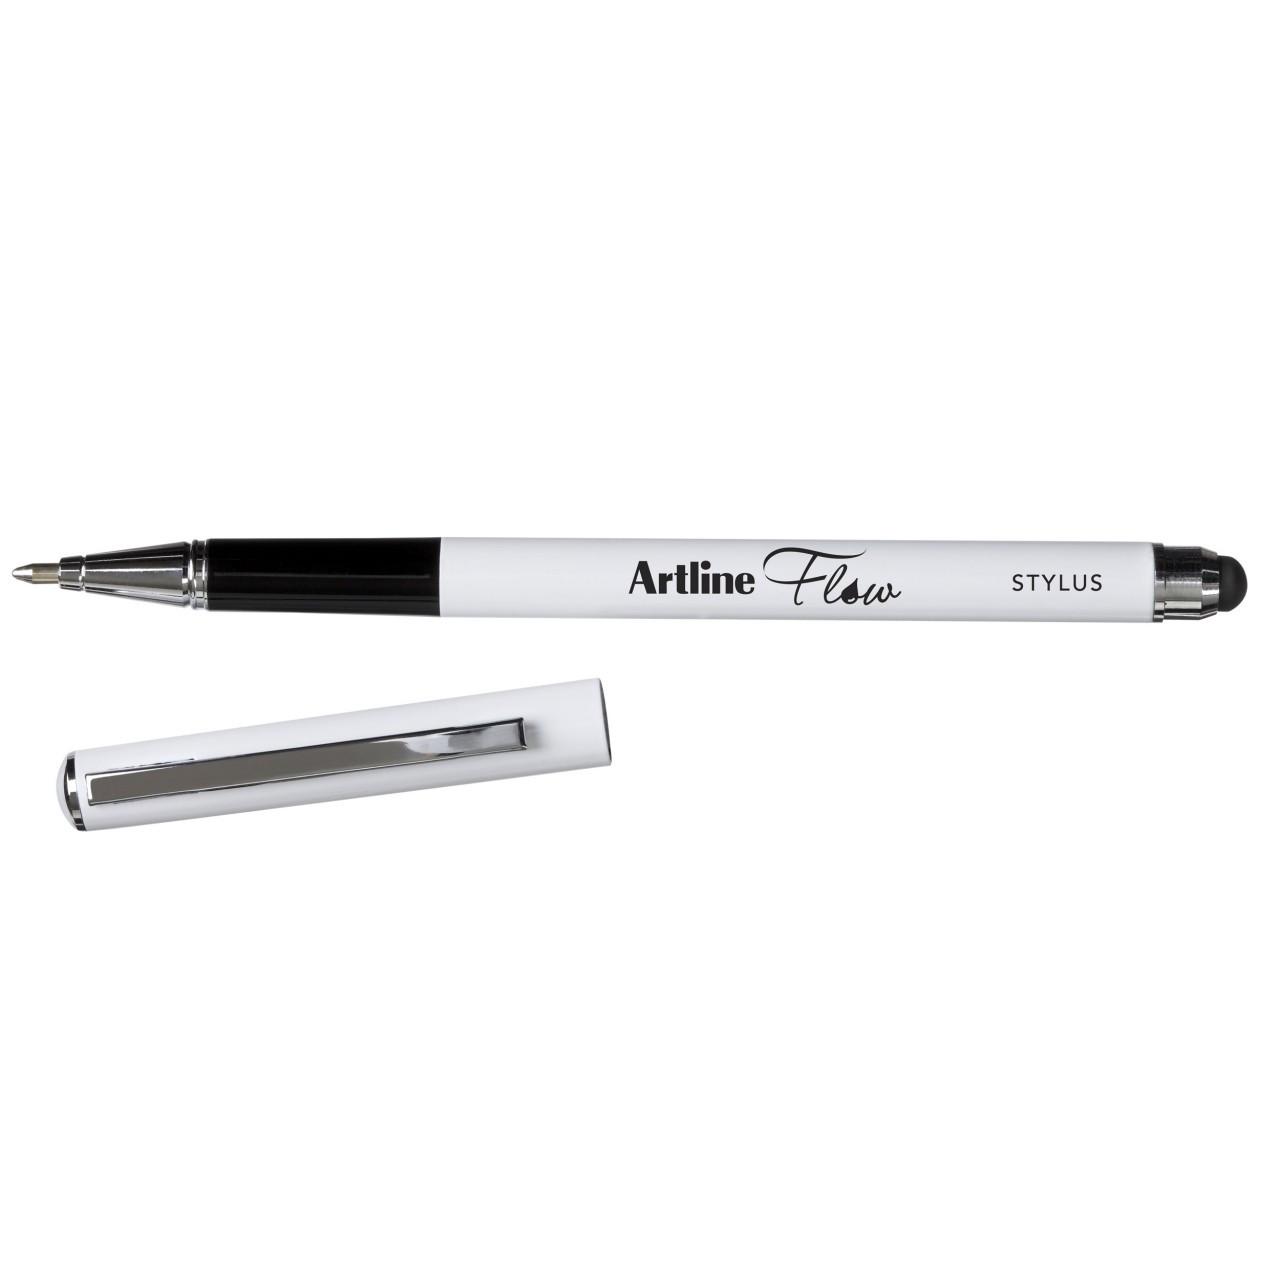 Artline Flow Metal Barrel Stylus Blue Pen (Bx12)